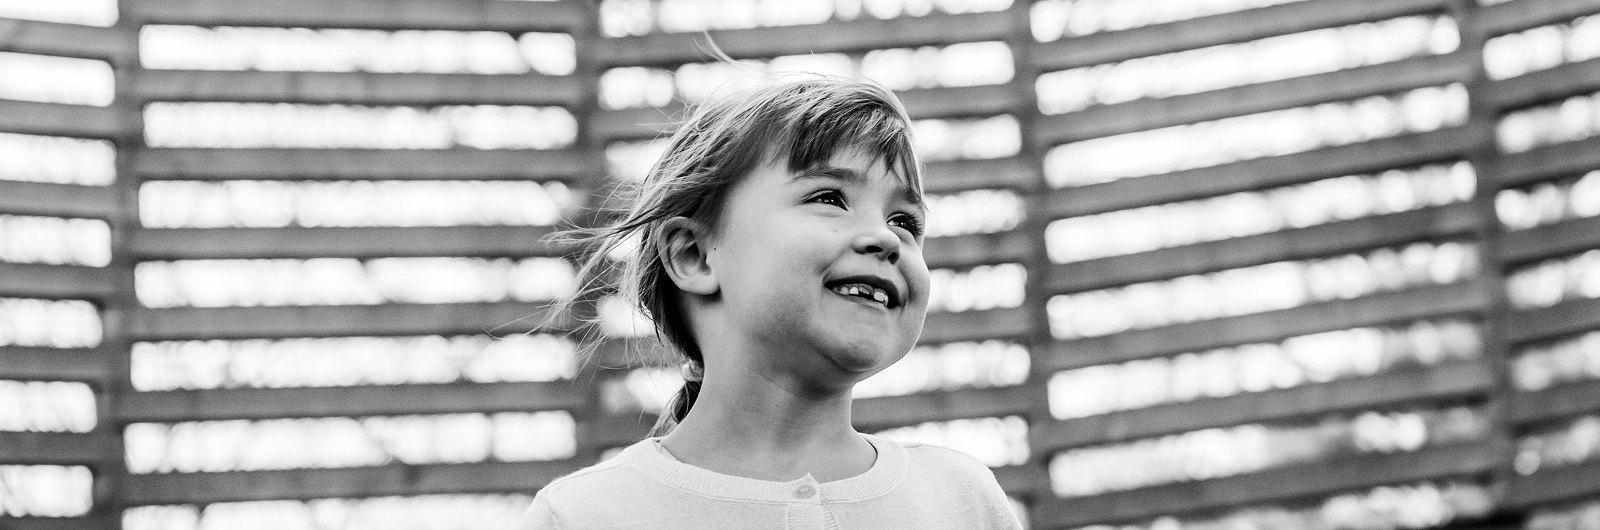 Lentefeest communie patricia de rycke fotograaf gent